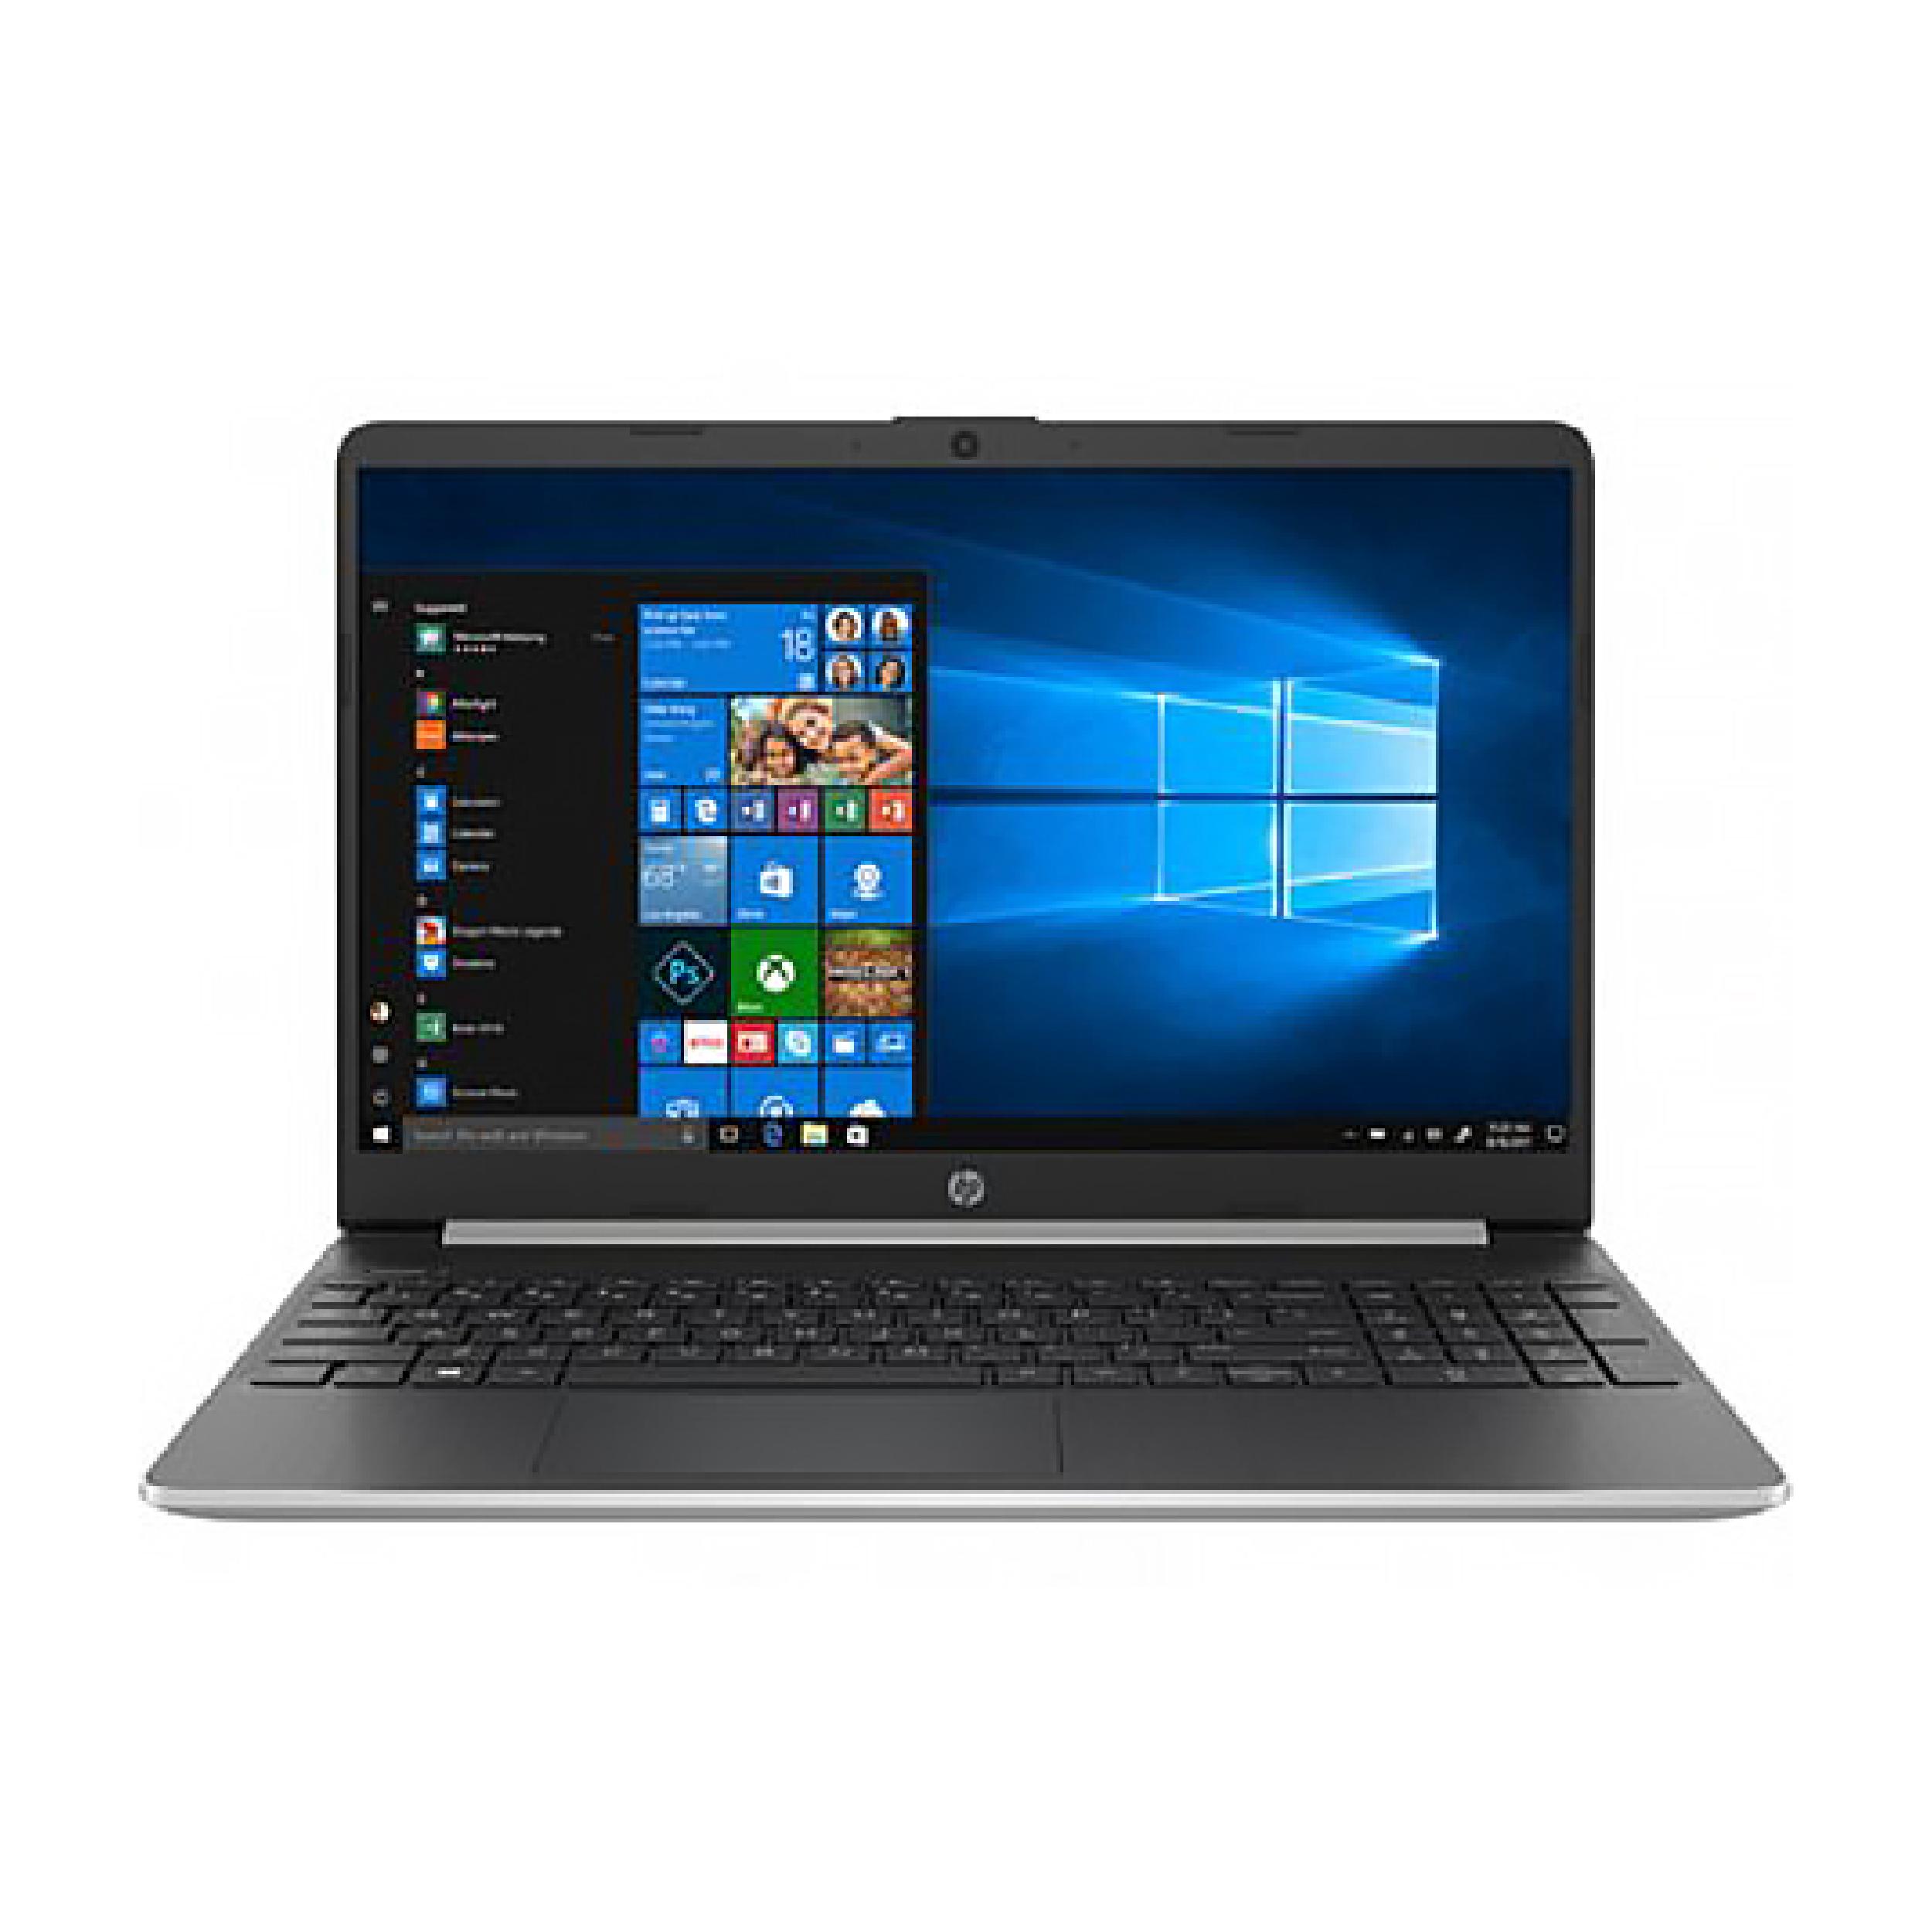 Laptop HP 15s-fq1038nm 8RS17EA